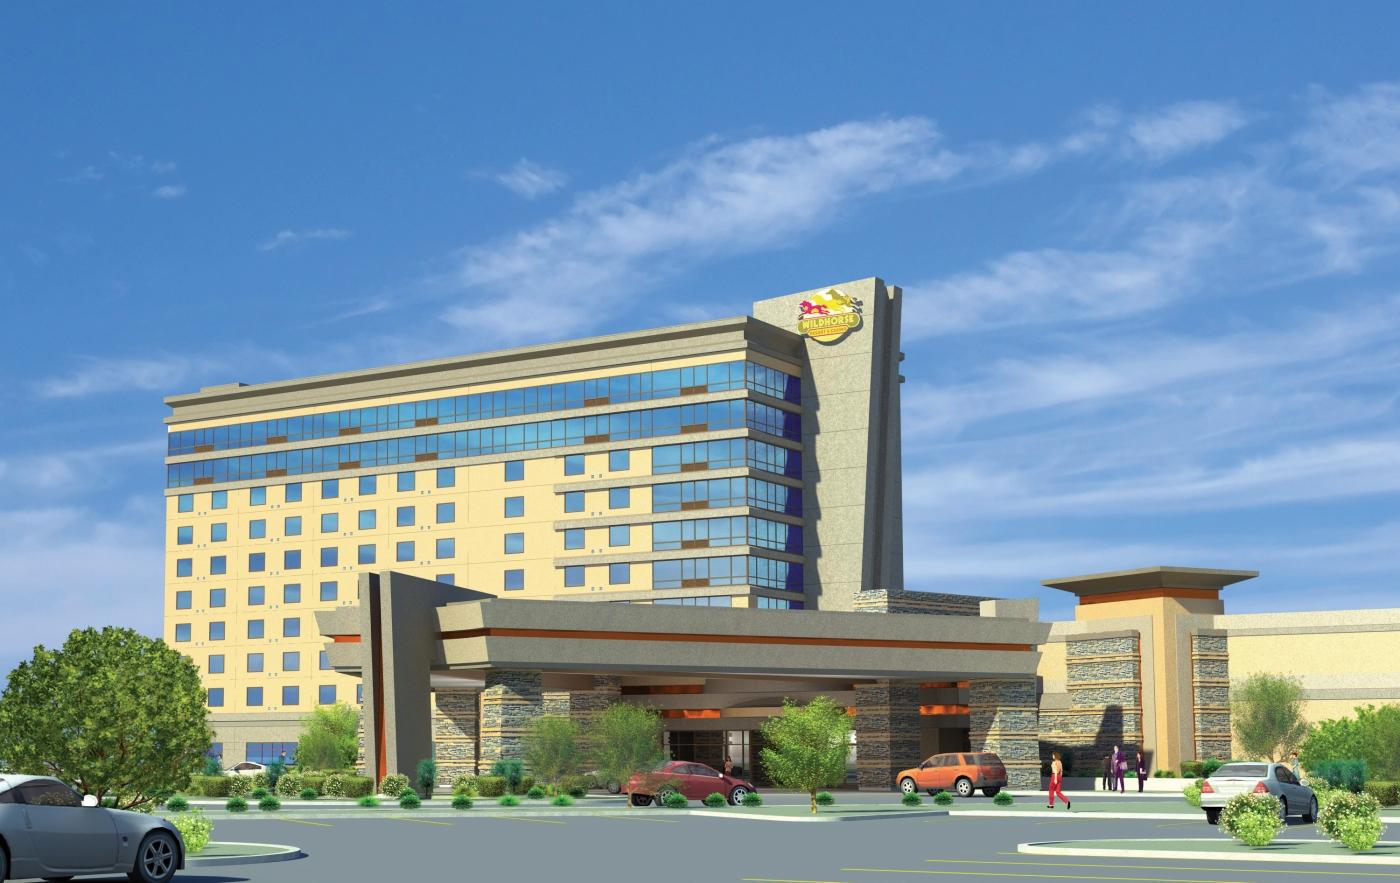 Umatilla casino